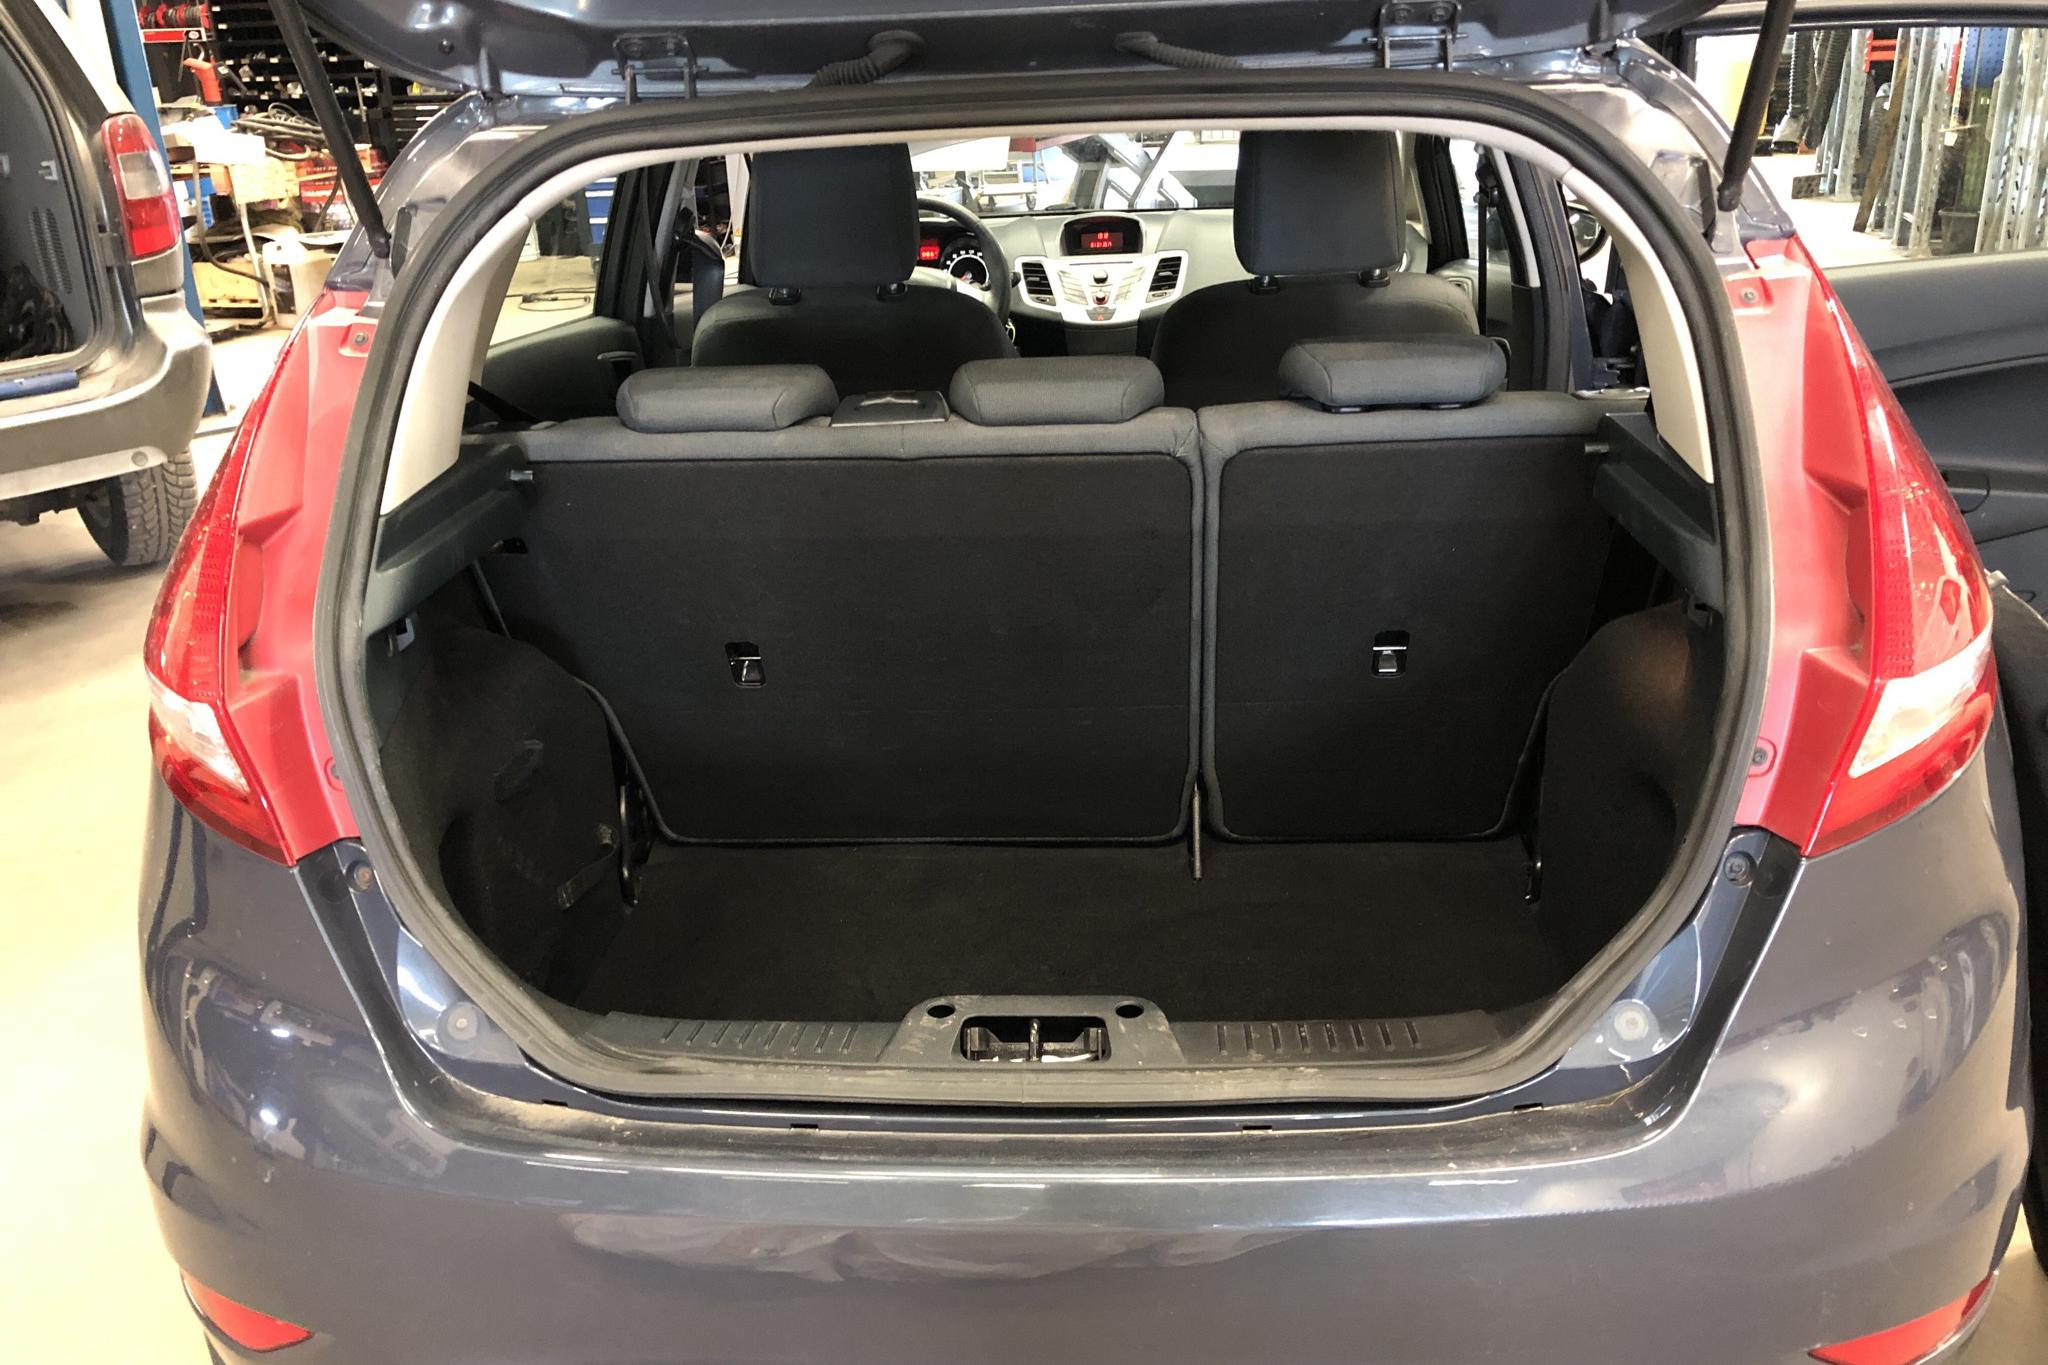 Ford Fiesta 1.6 TDCi 5dr (95hk) - 164 820 km - Manual - gray - 2012